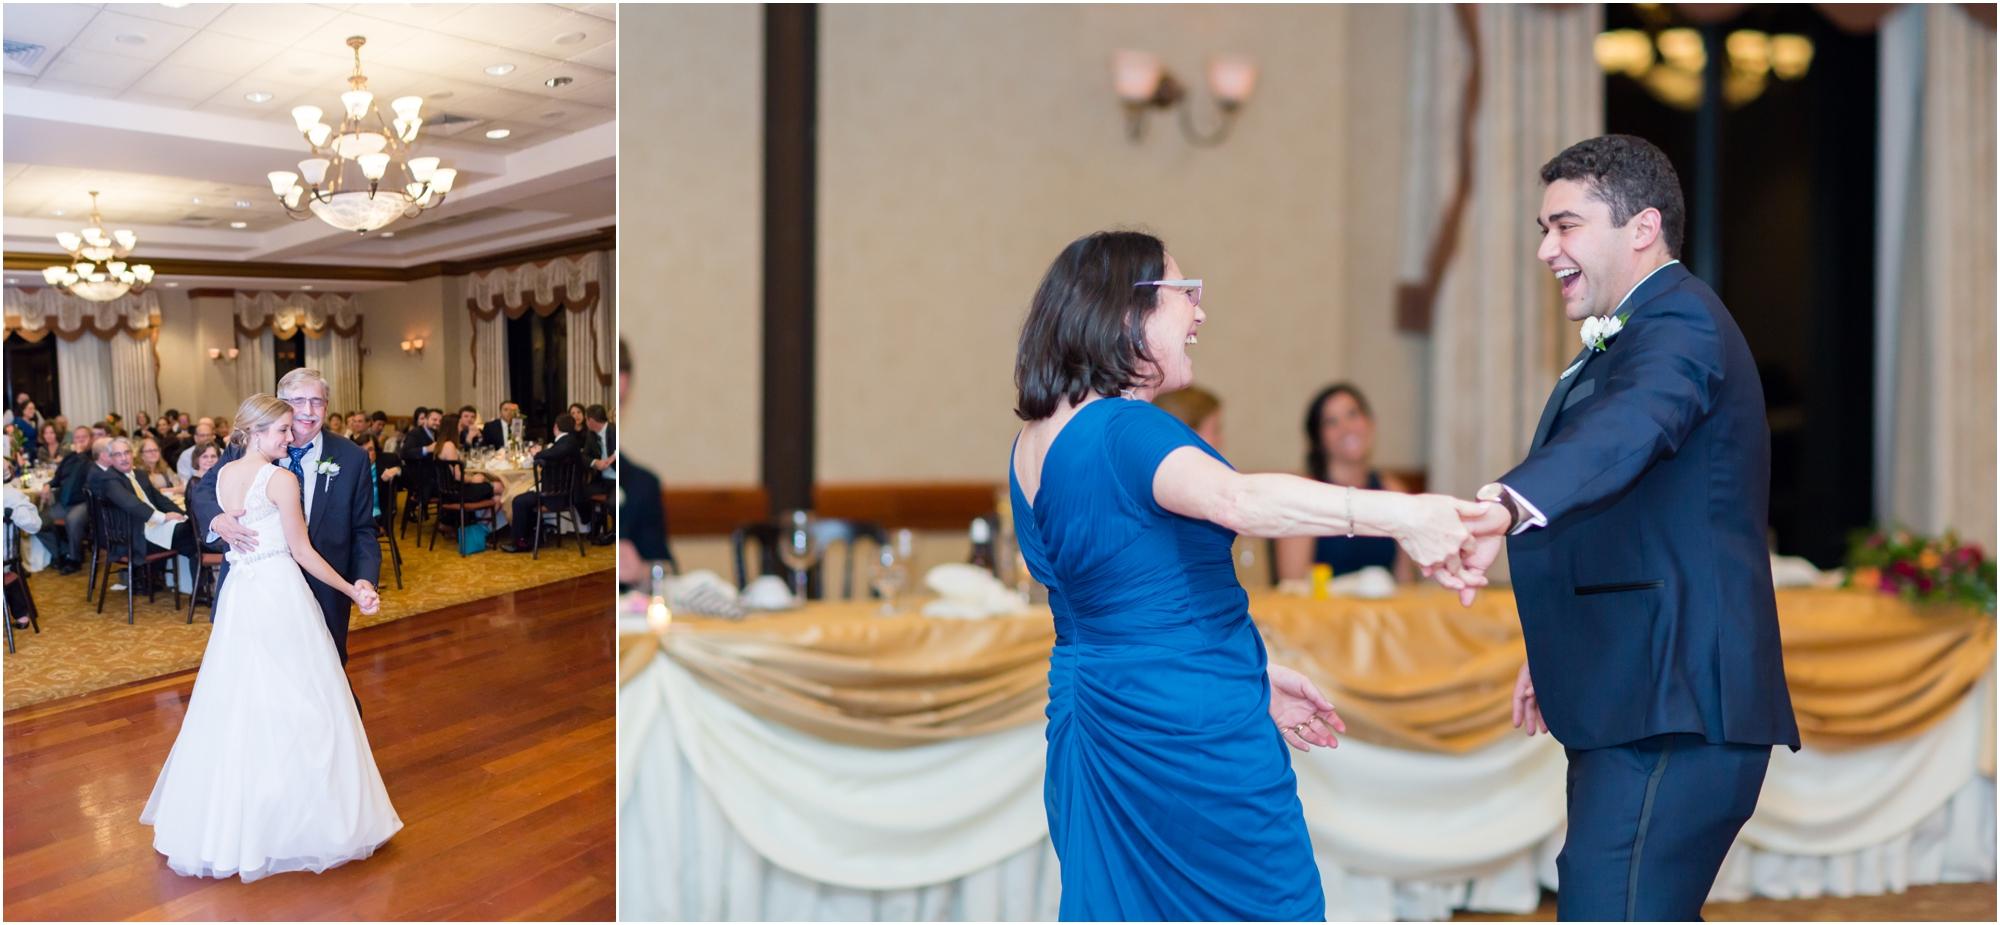 6-Finkel Wedding Reception-813_anna grace photography maryland wedding photographer turf valley.jpg